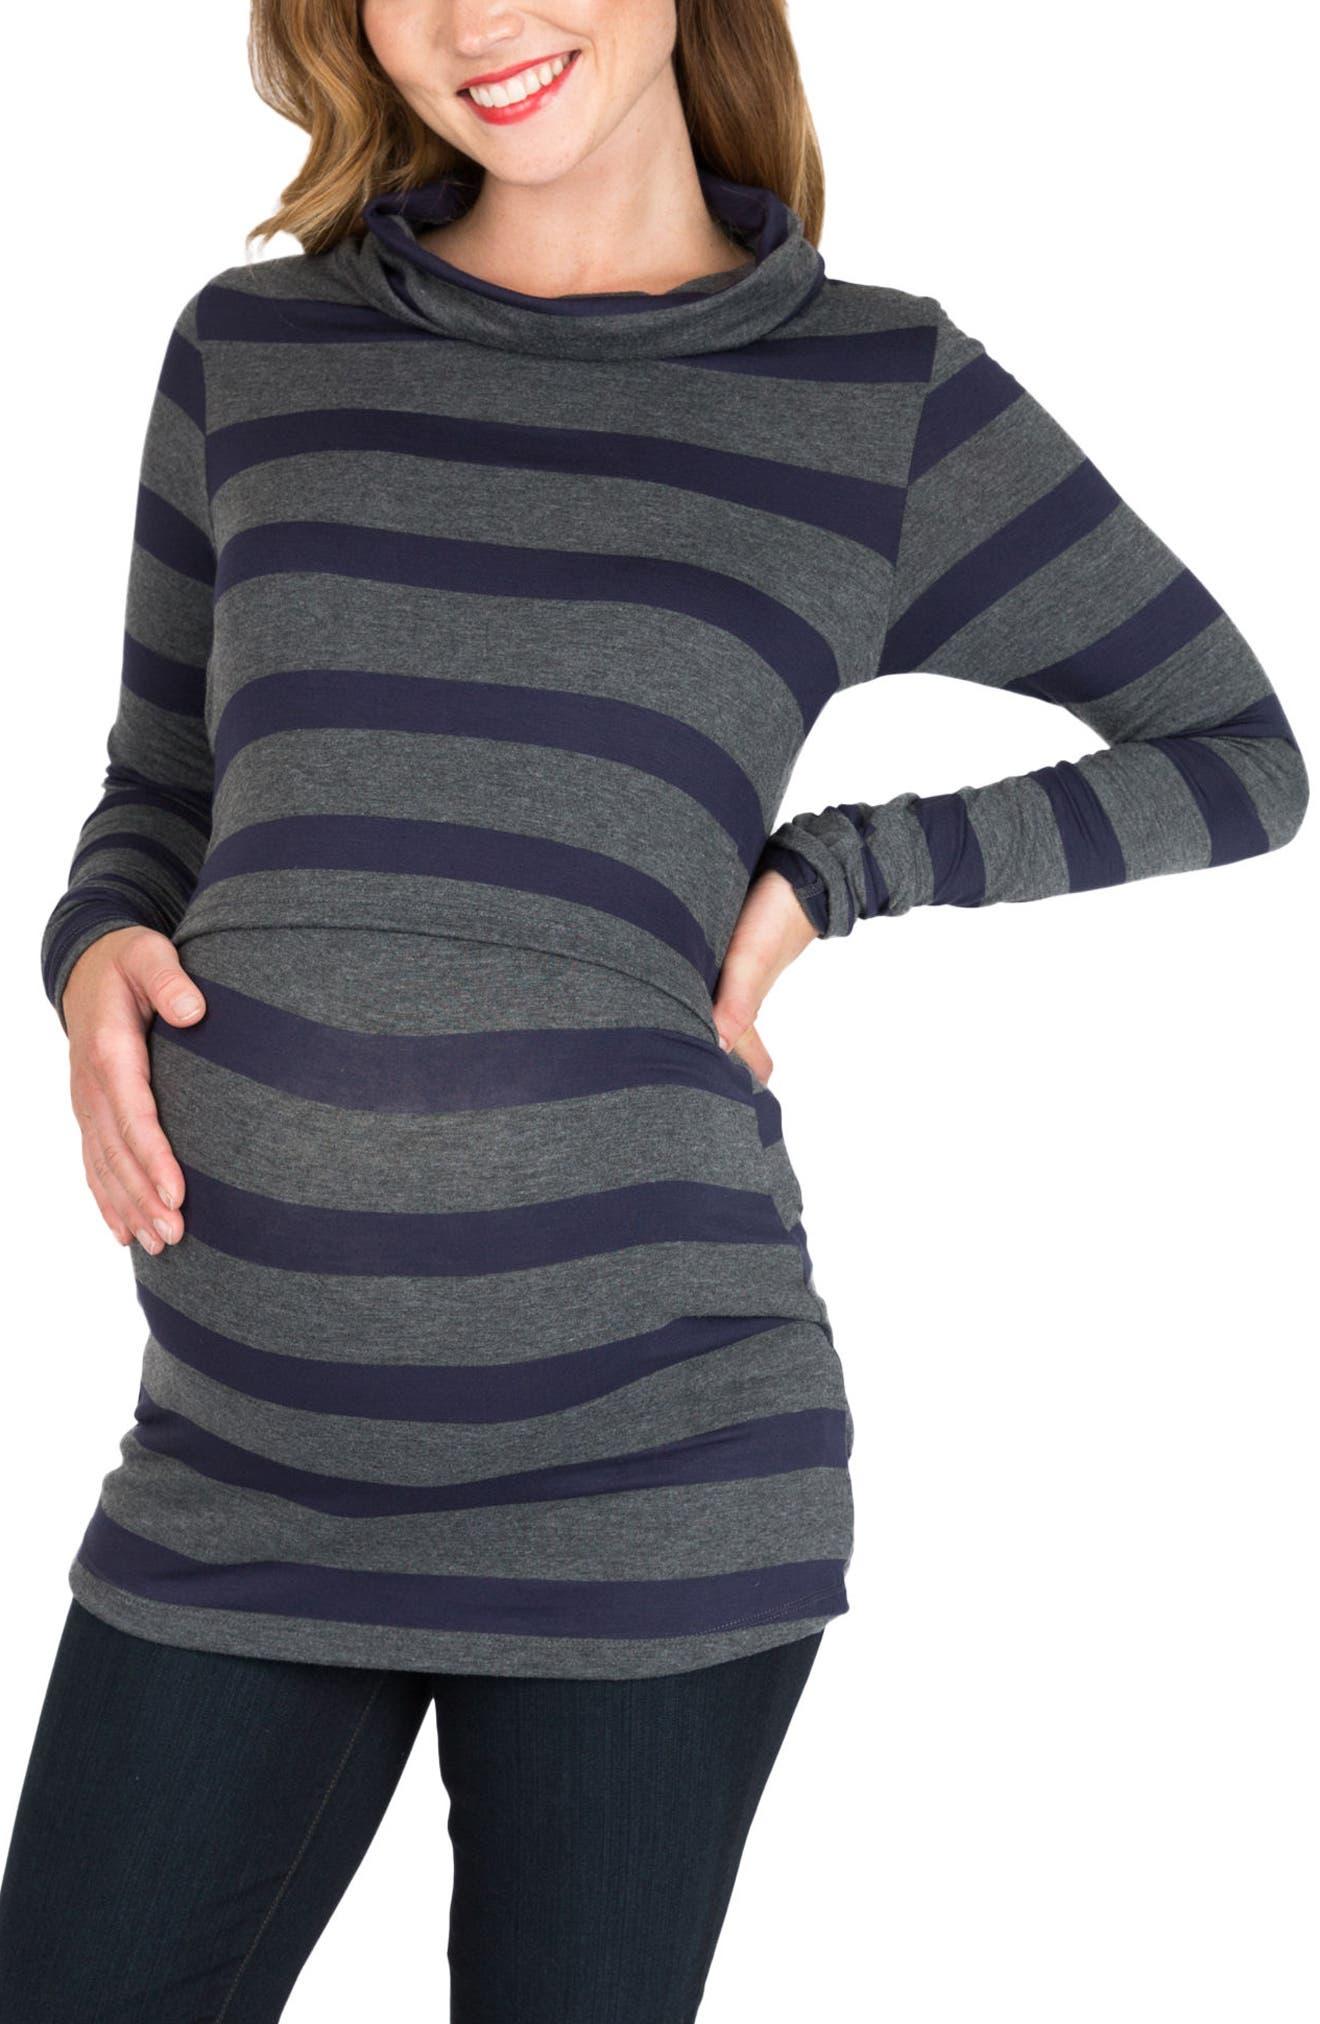 NOM Shelley Maternity/Nursing Turtleneck Tunic,                             Main thumbnail 1, color,                             CHARCOAL NAVY